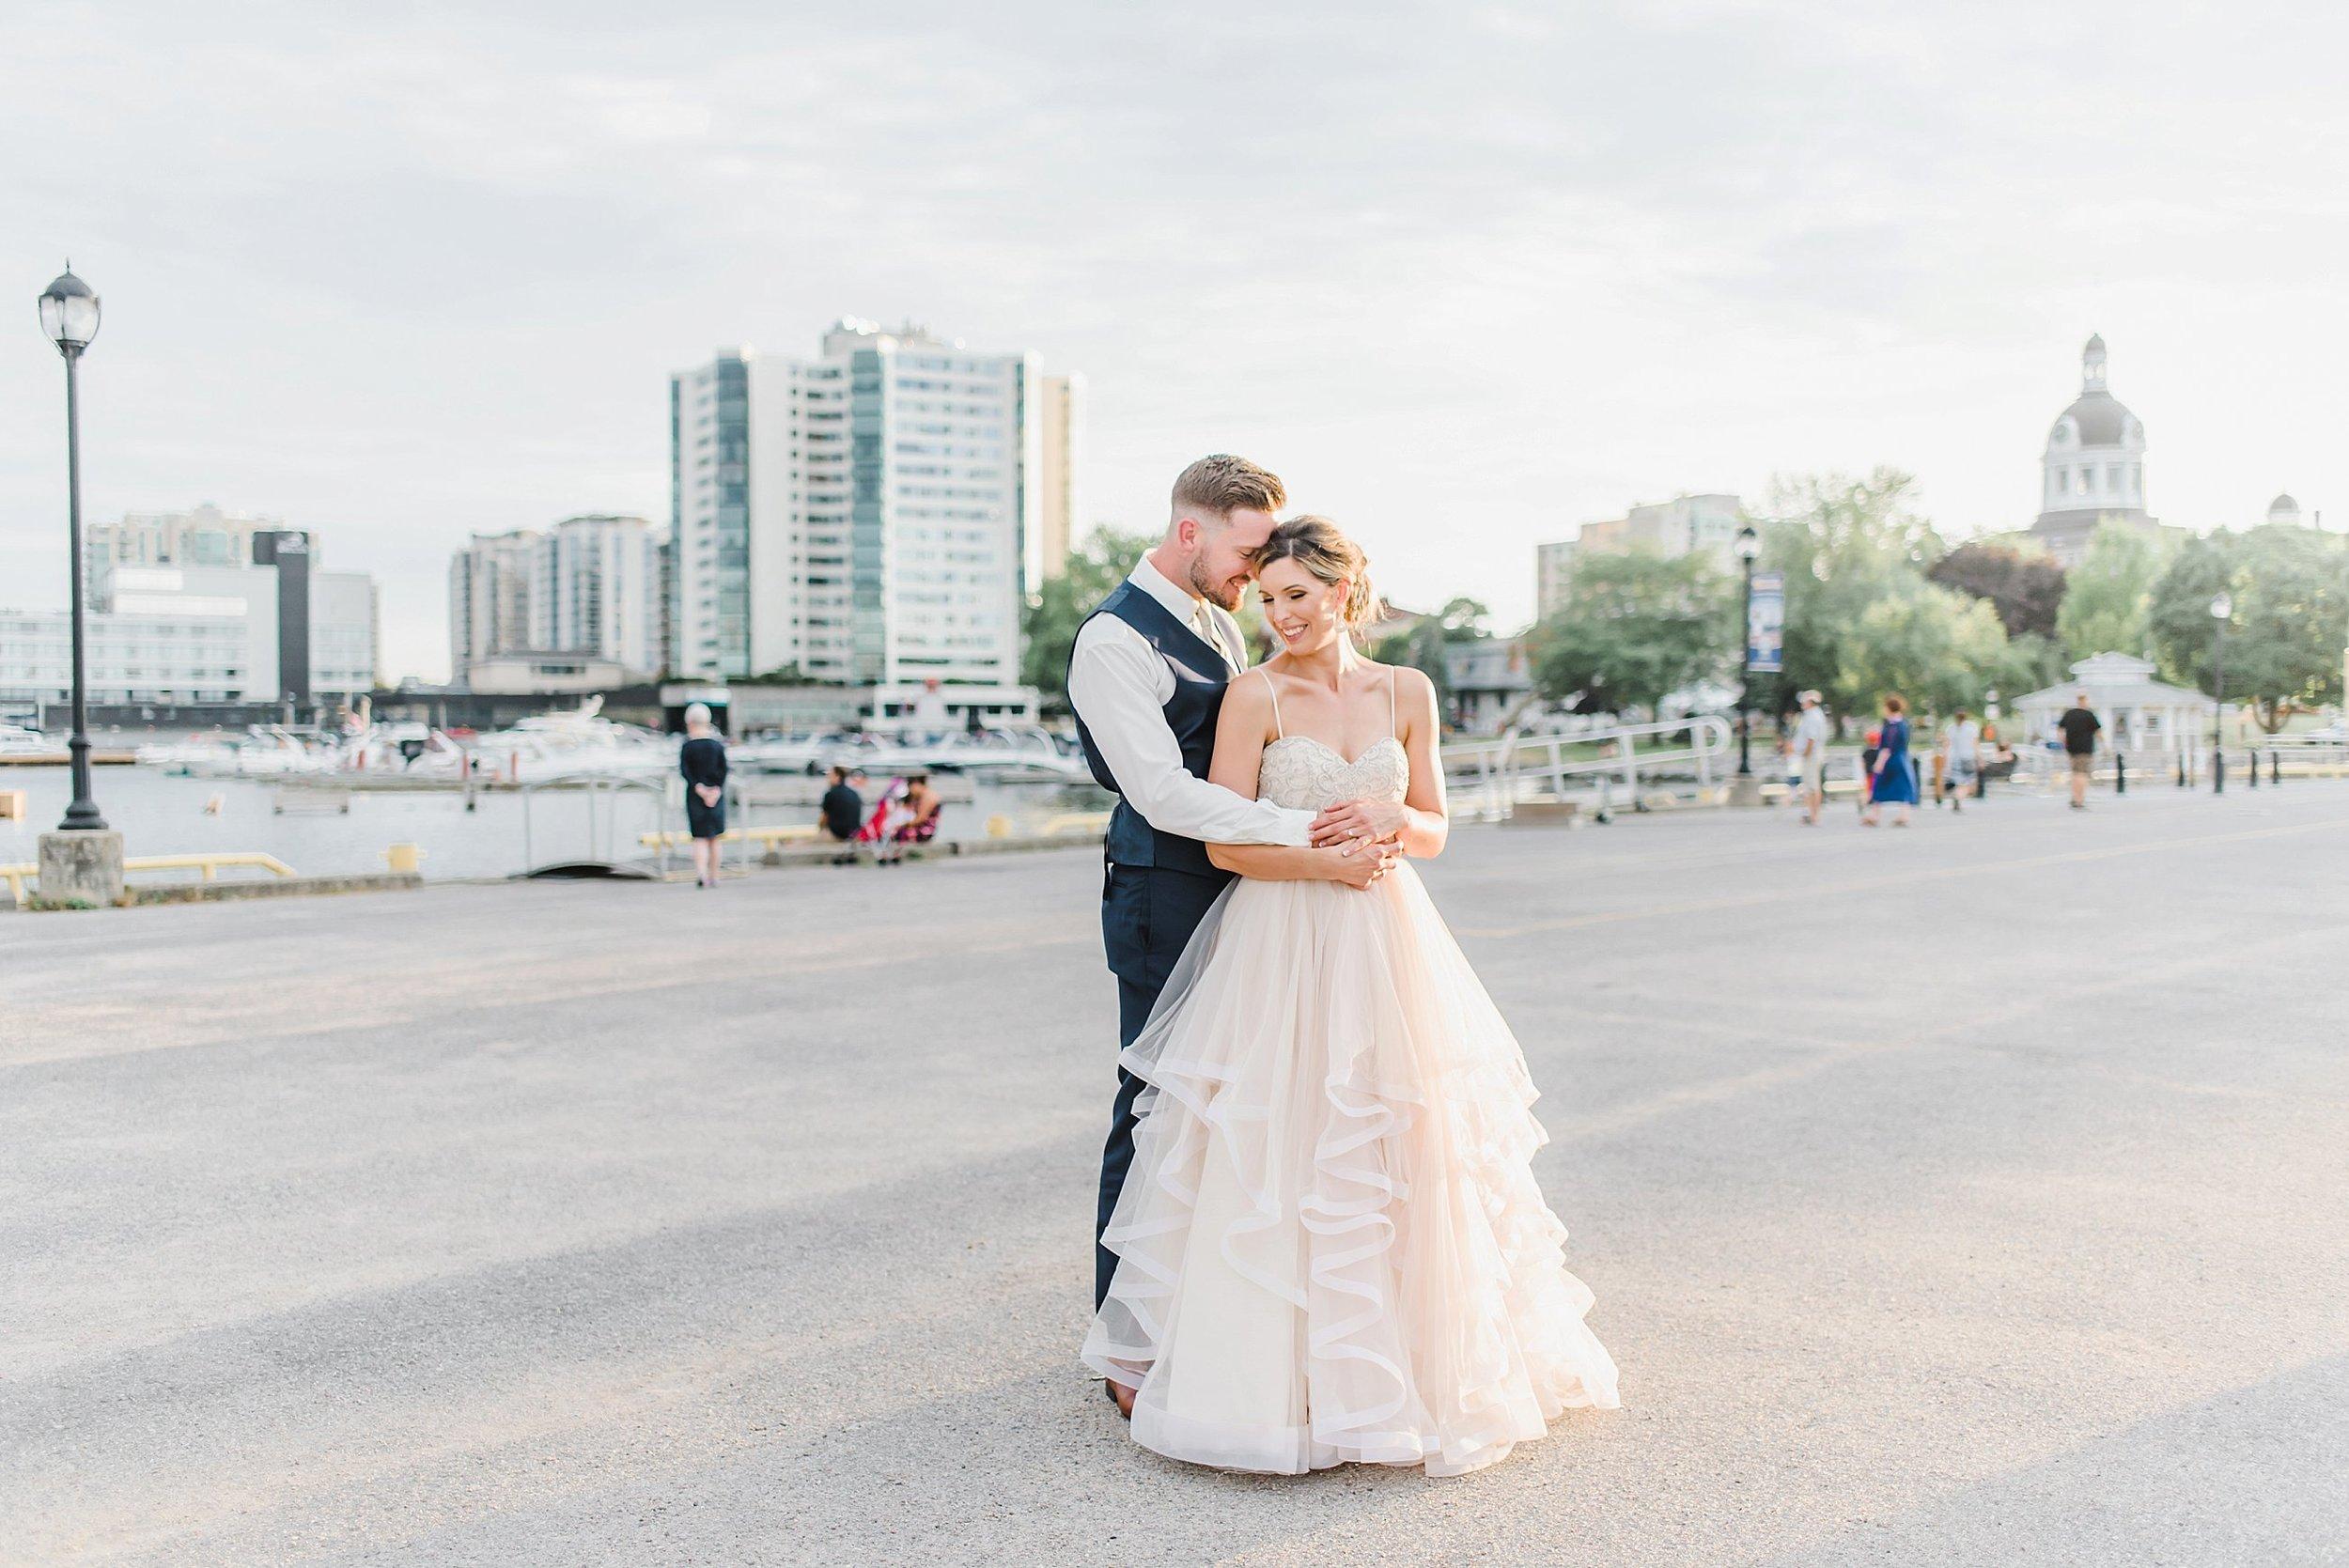 light airy indie fine art ottawa wedding photographer | Ali and Batoul Photography_0234.jpg